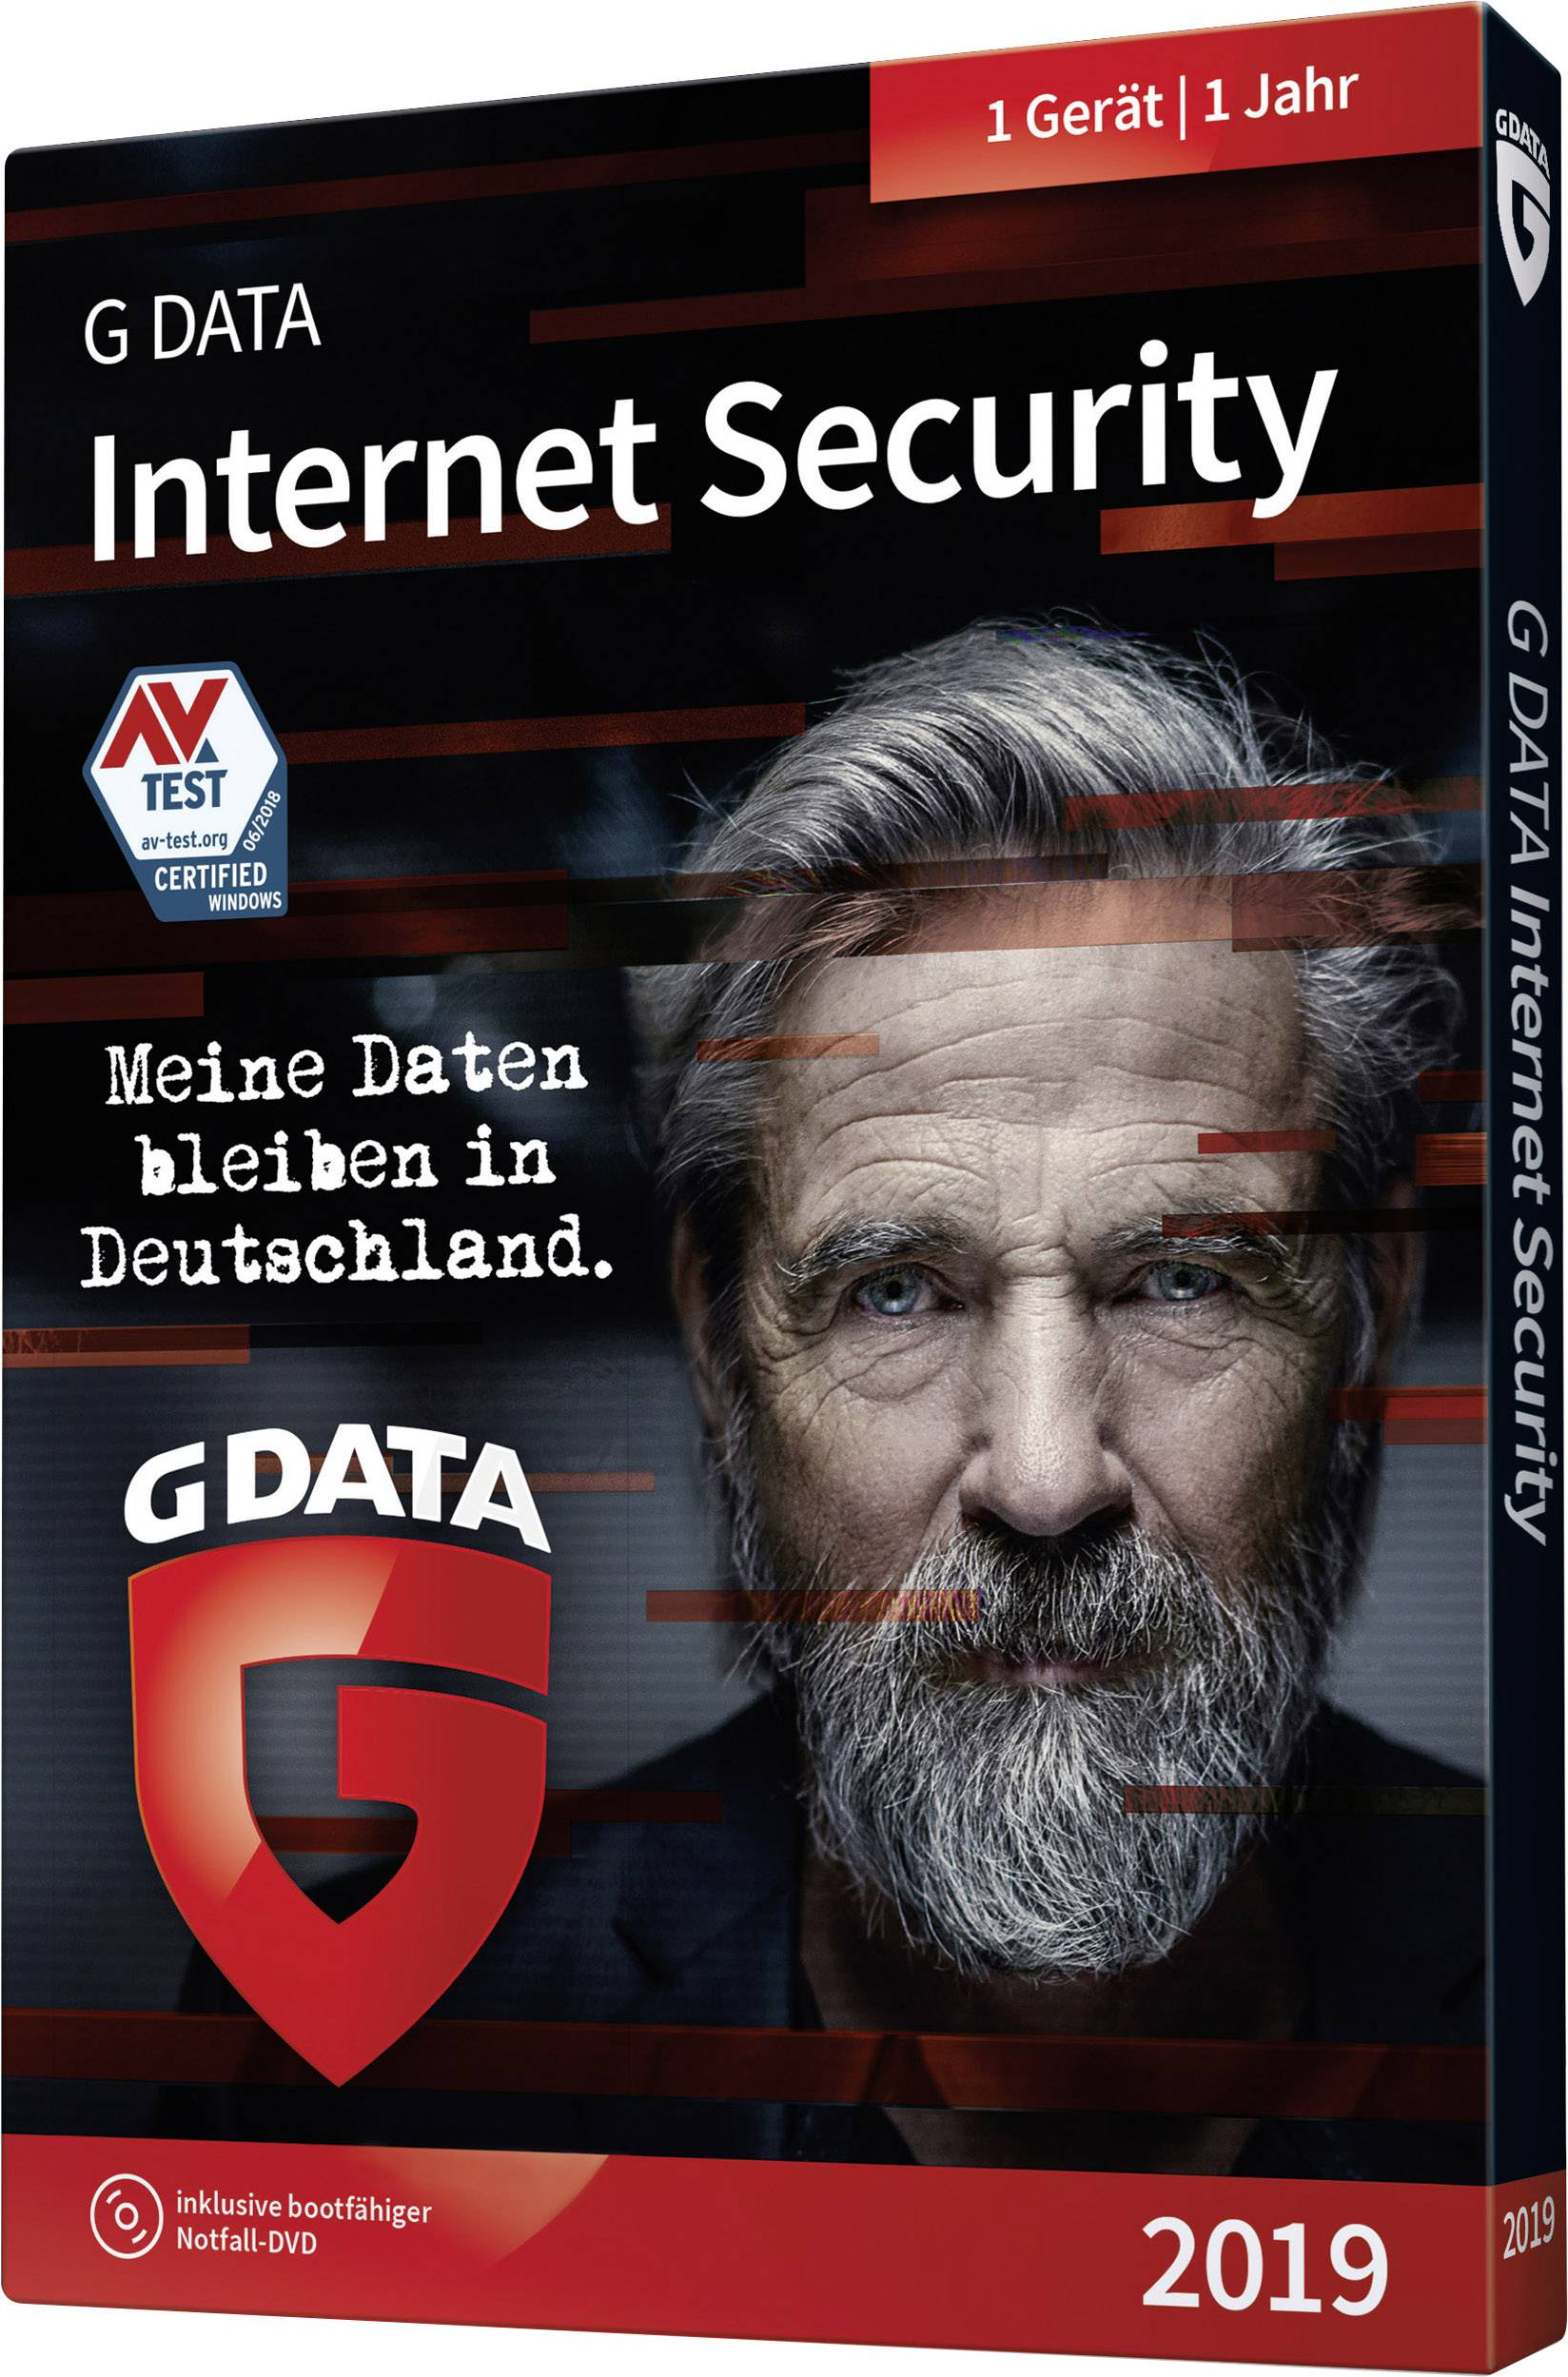 Pcs jahr data android g 2 internet 2 security 1 cdn.dewtour.com: McAfee